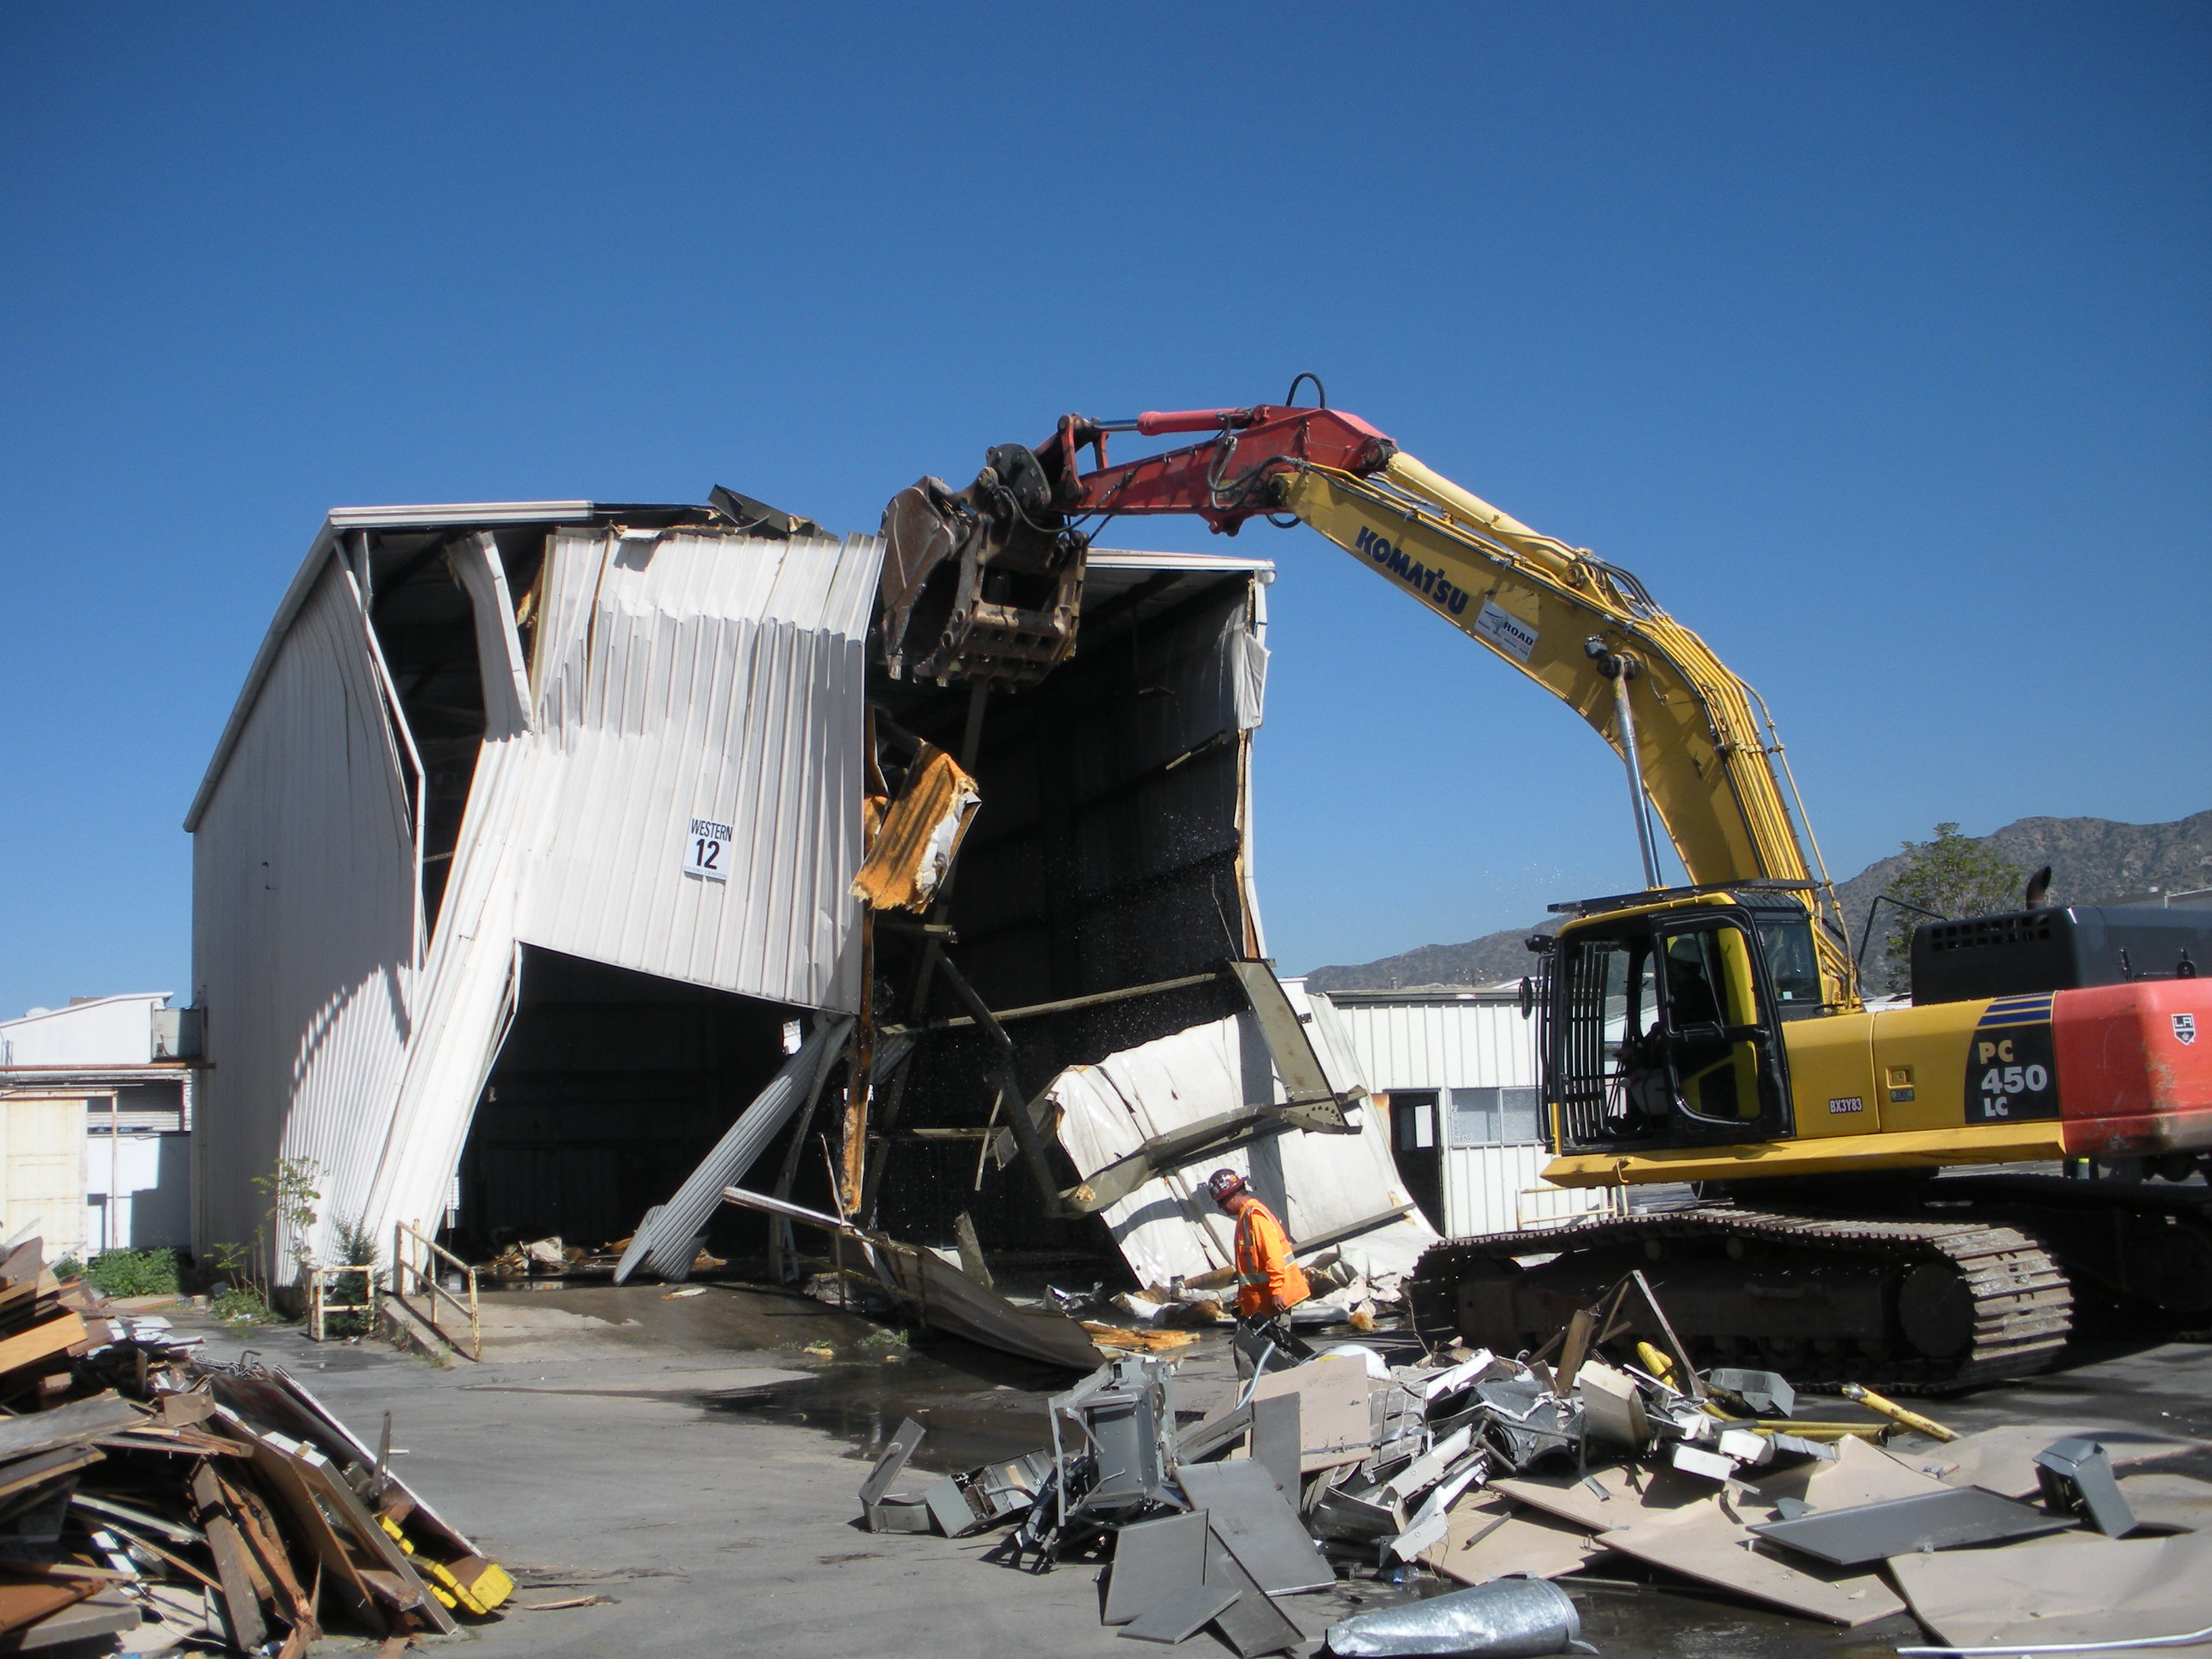 Demolition begins at site of future ikea burbank store for Ikea burbank california